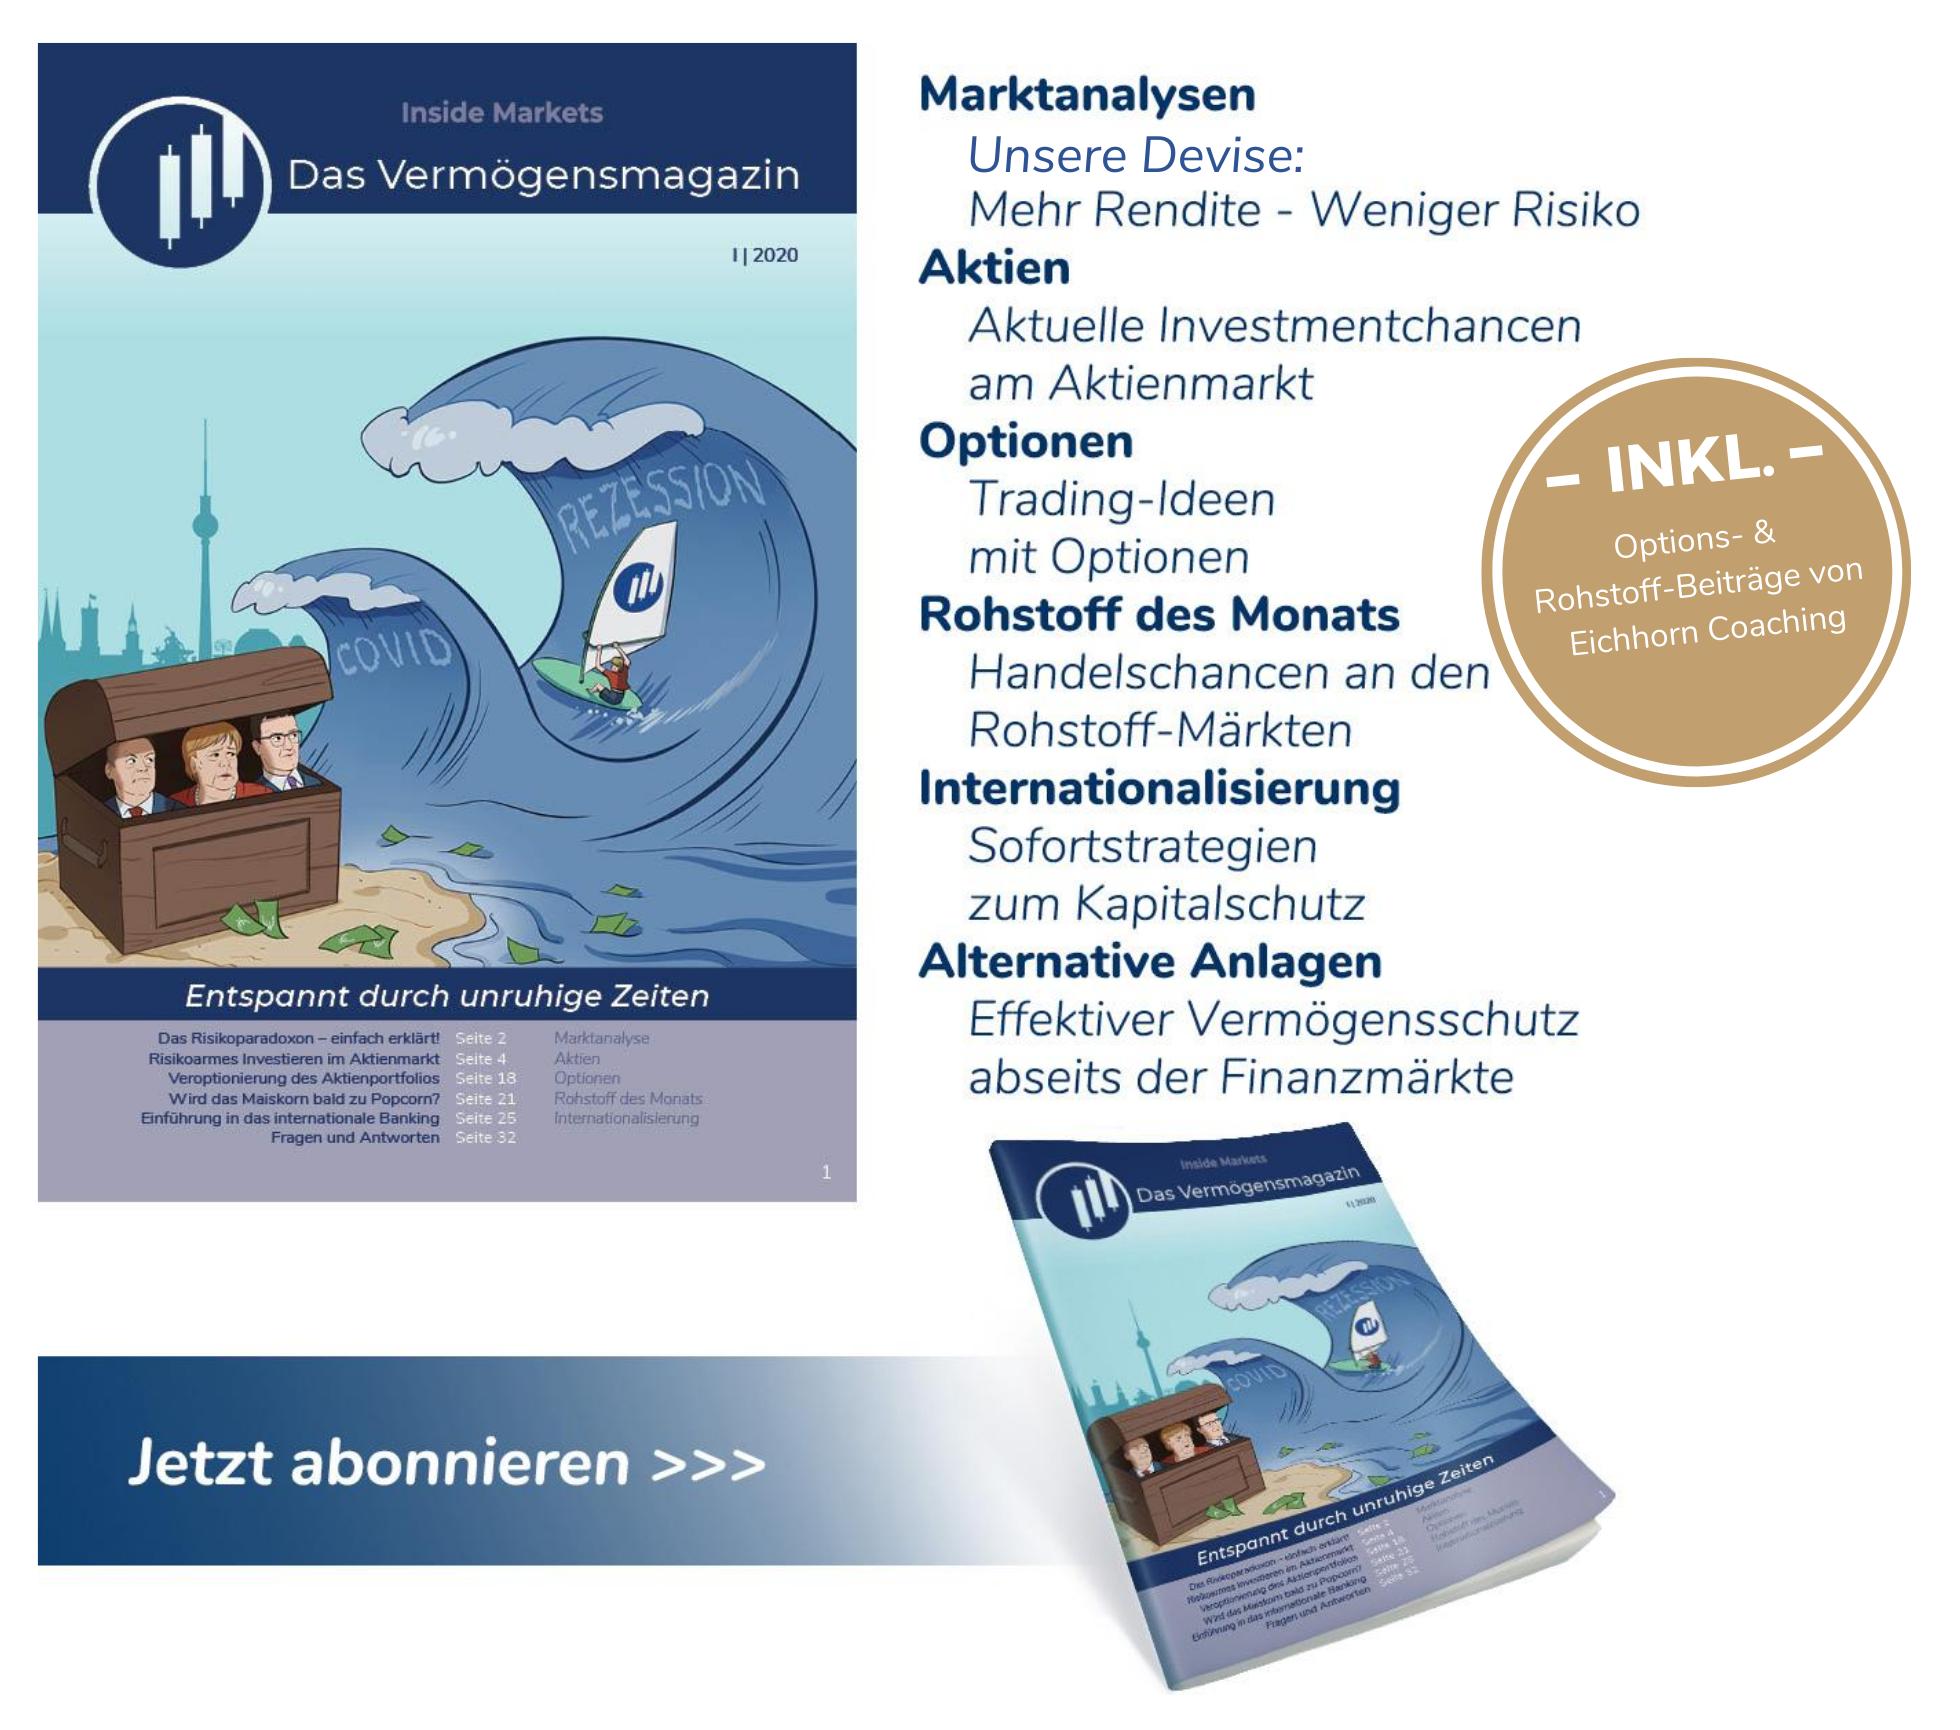 Inside Markets Das Vermögensmagazin